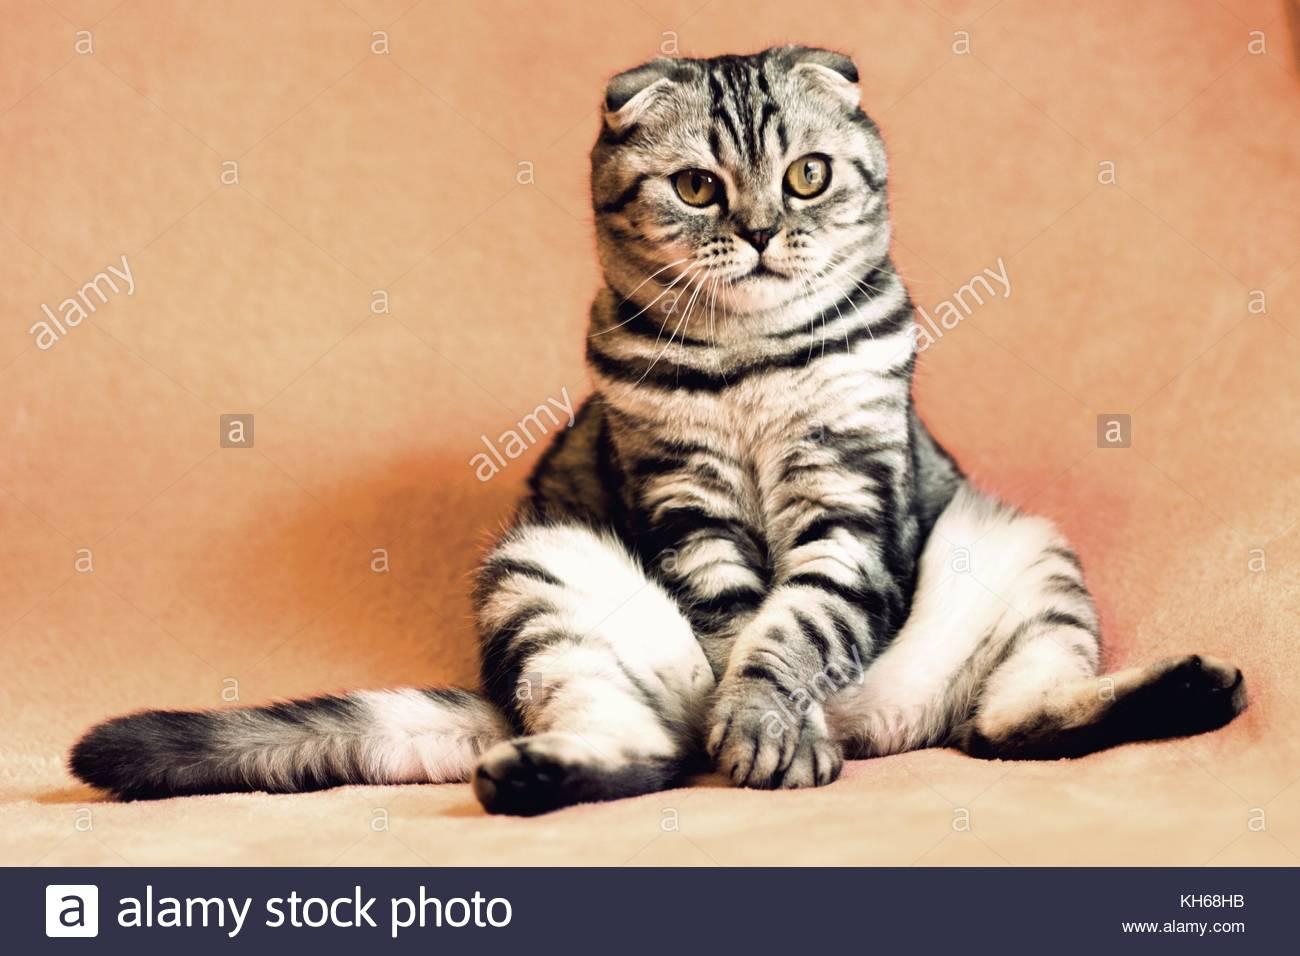 cat-portrait-KH68HB.jpg